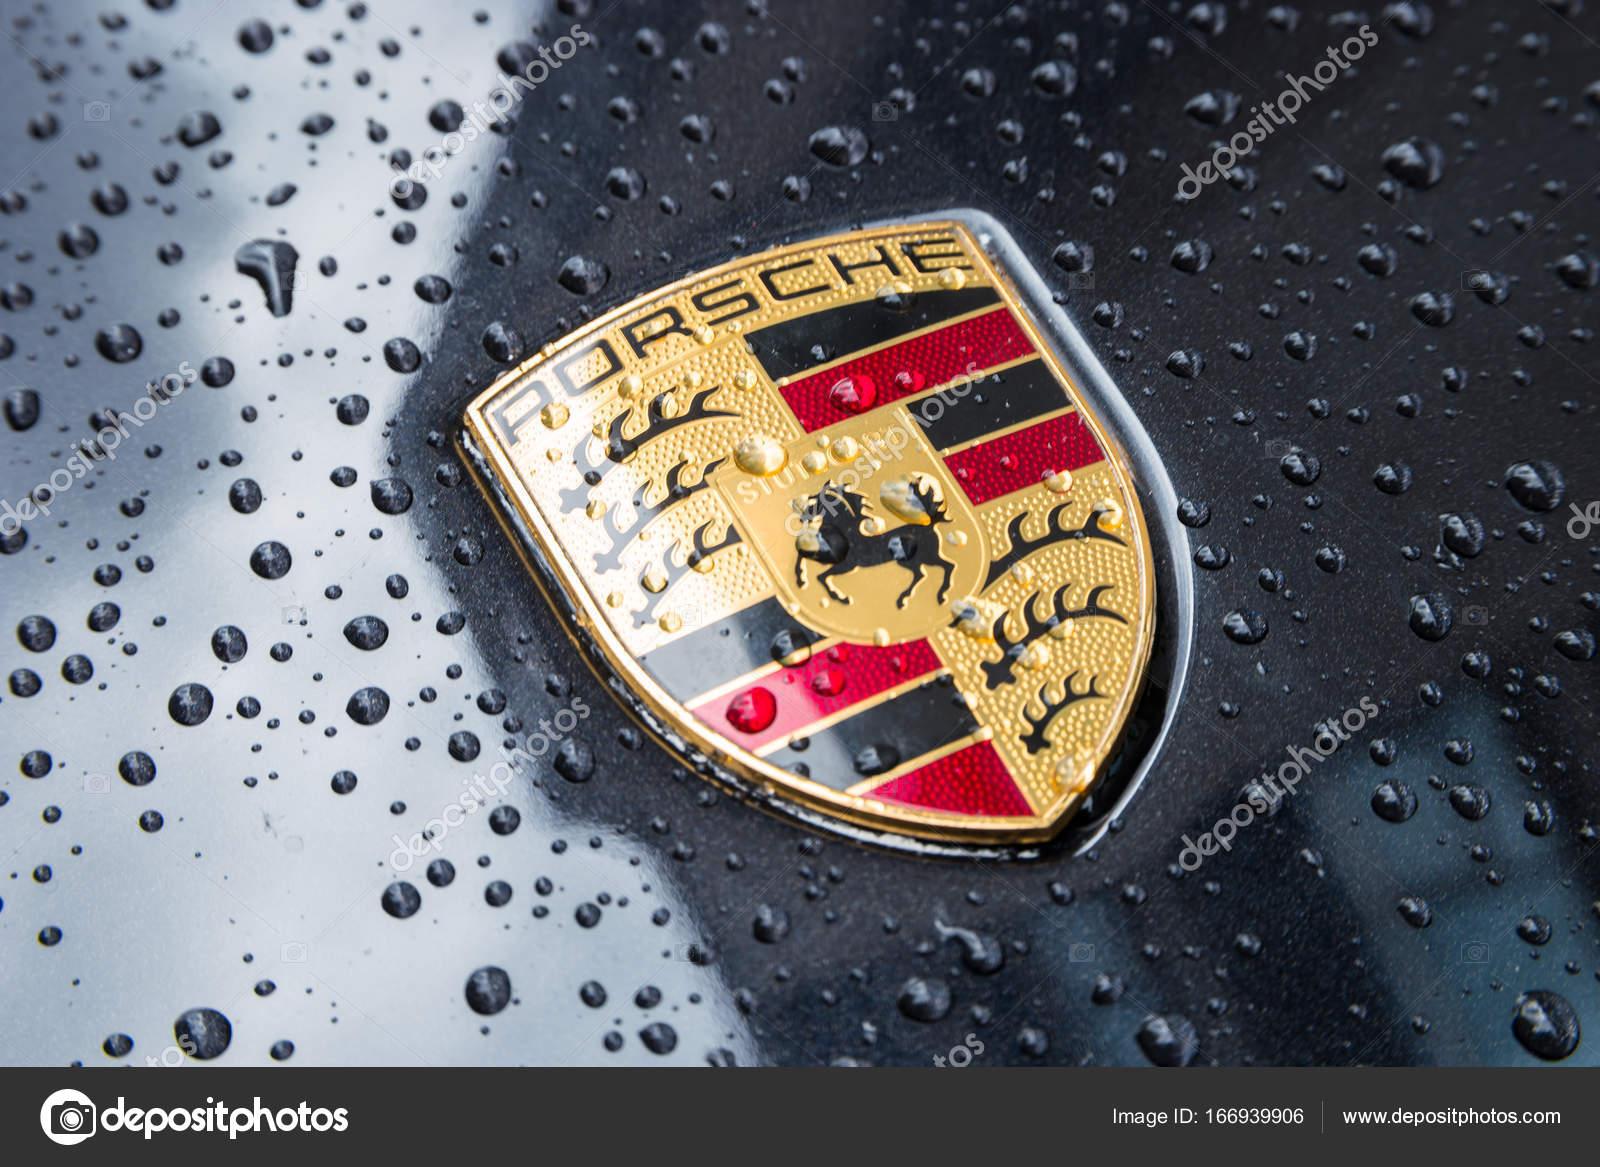 Porsche Logo Close Up On A Black Car With Rain Drops Stock Editorial Photo C Rclassenlayouts 166939906